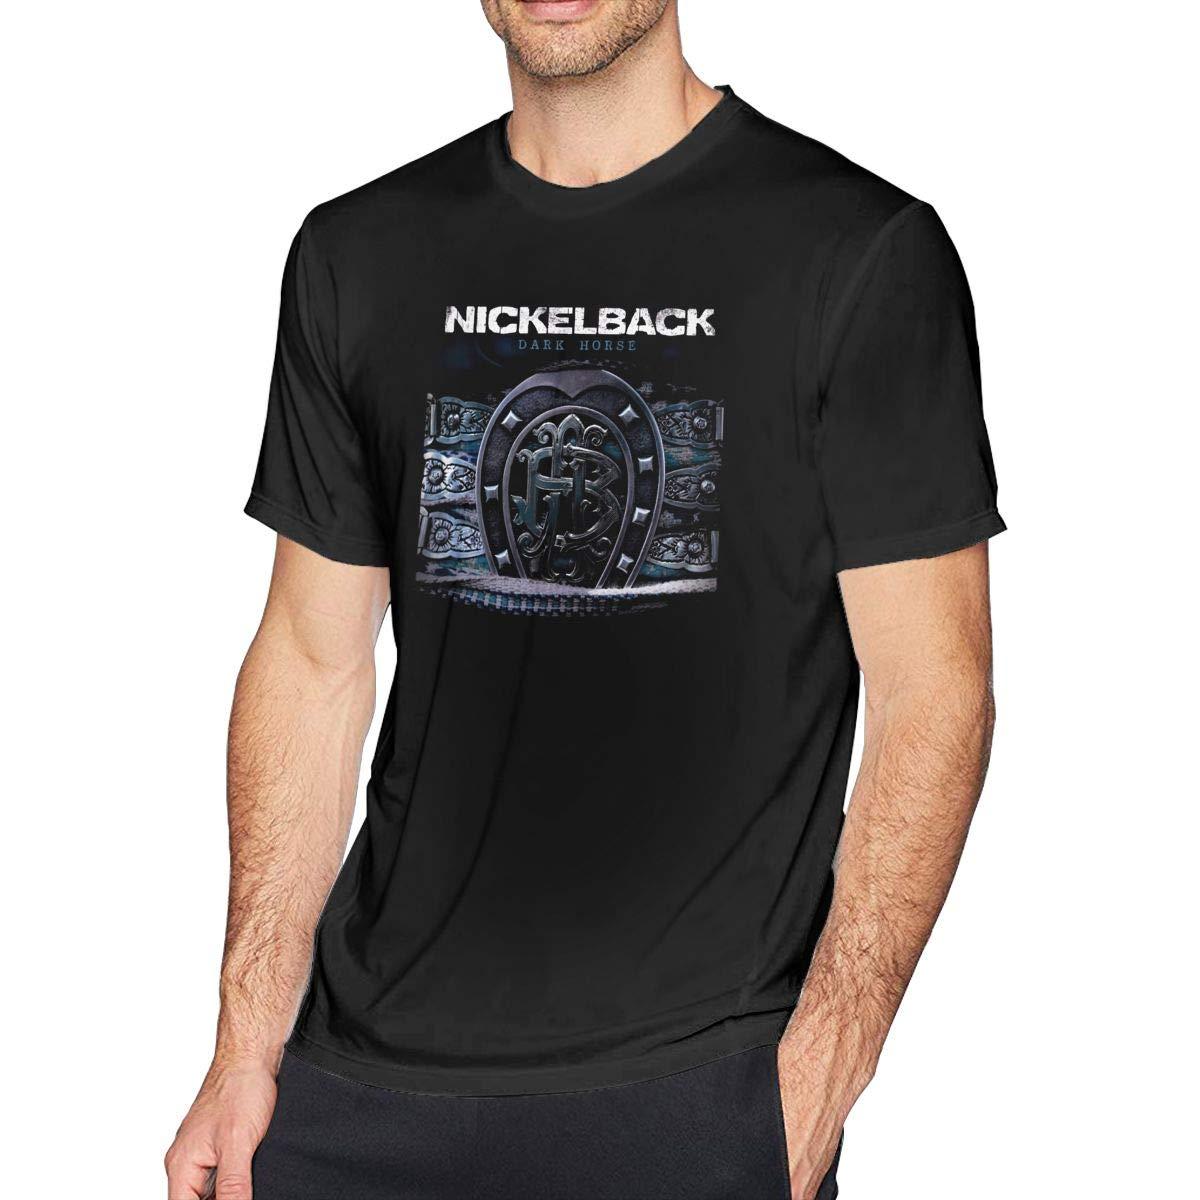 Nickelback Dark Horse Cool Short Sleeve Shirts